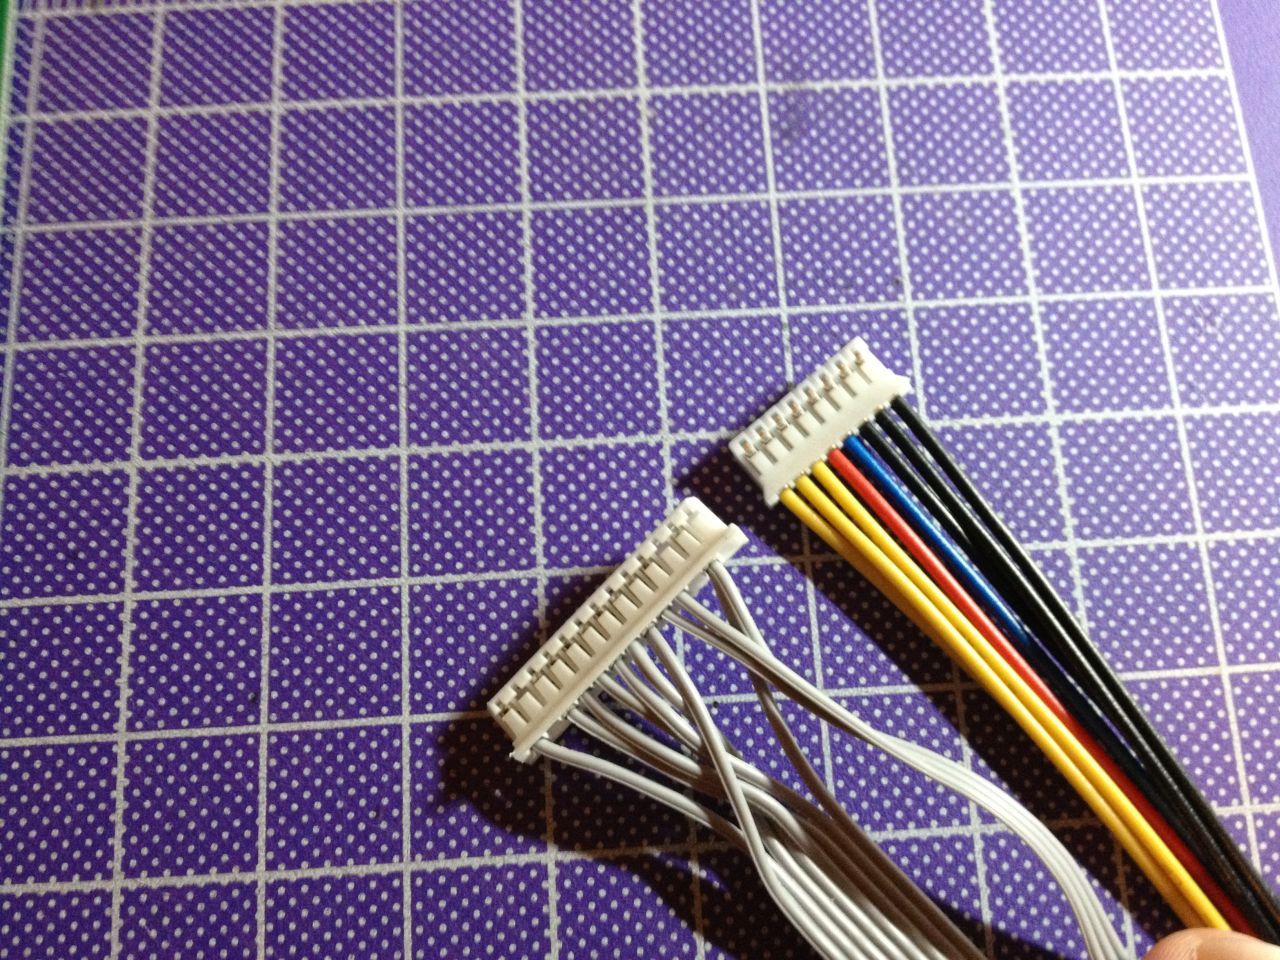 Rewire OSD cable to fit into new DVI board